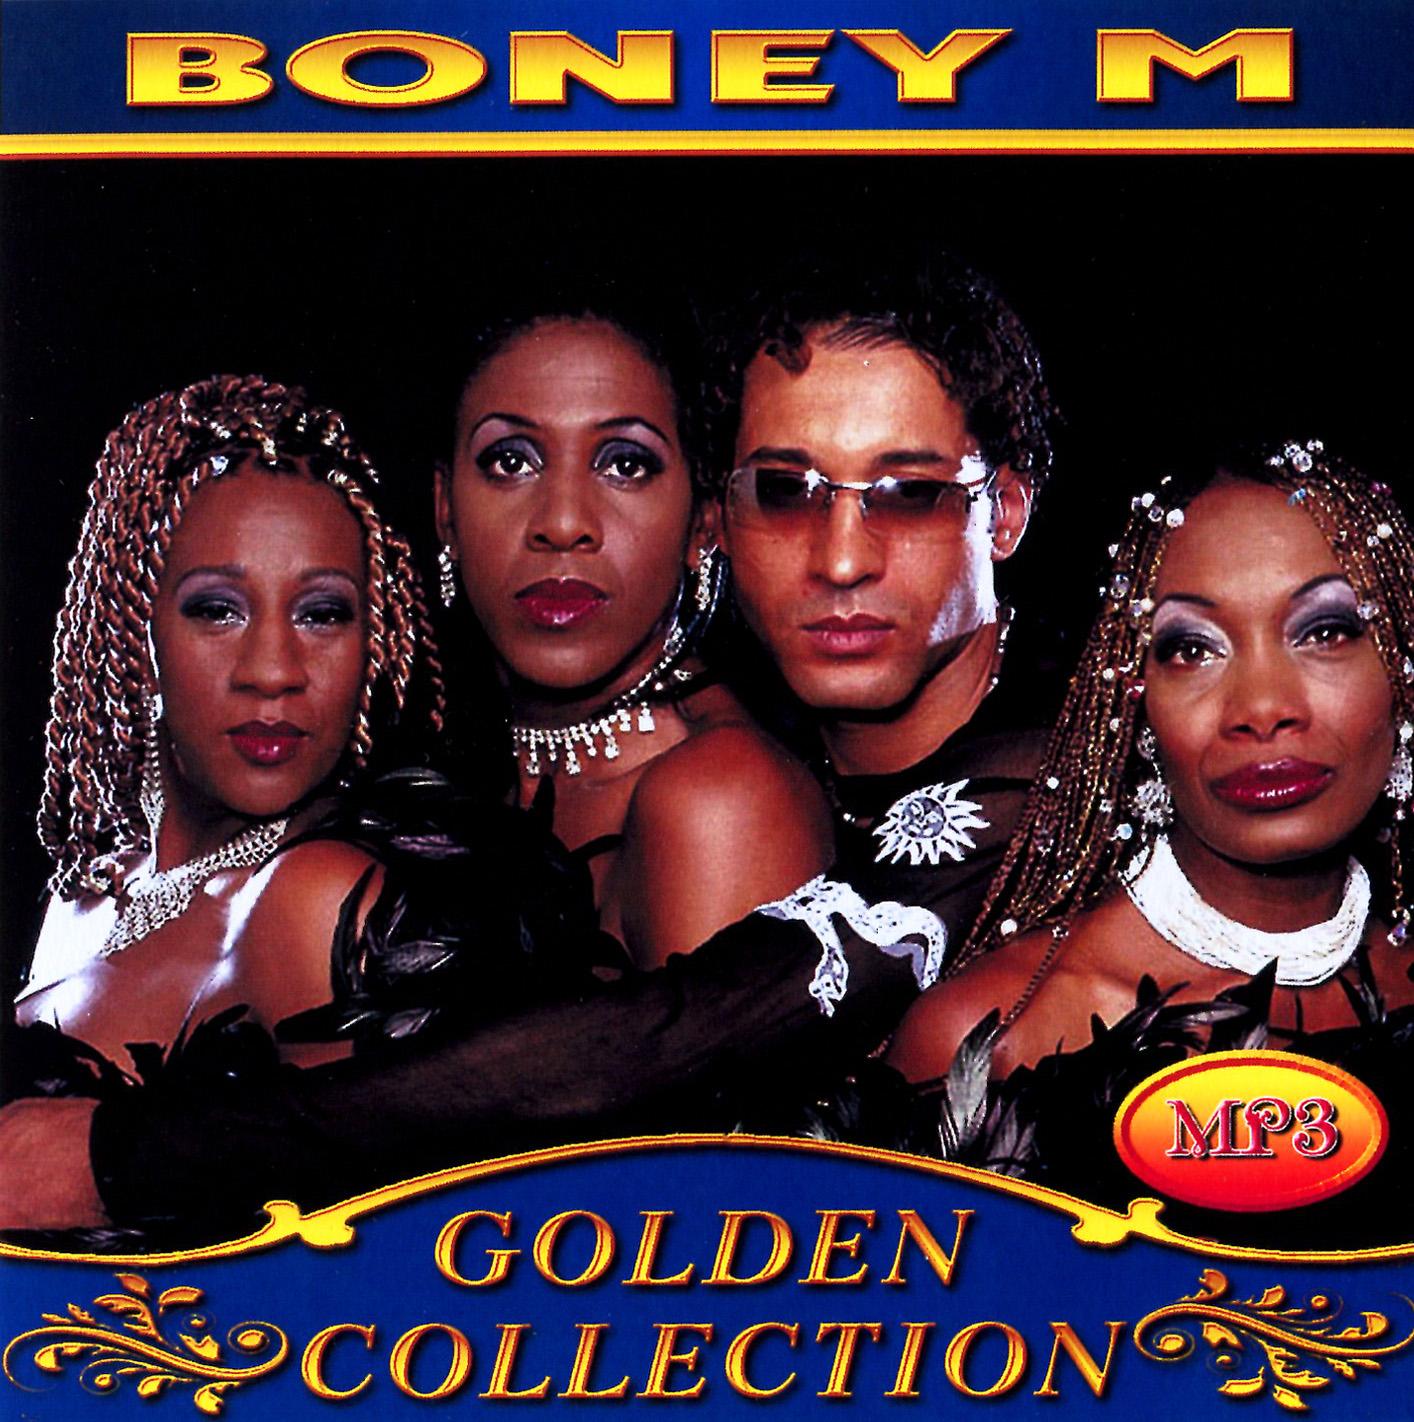 Boney M [mp3]